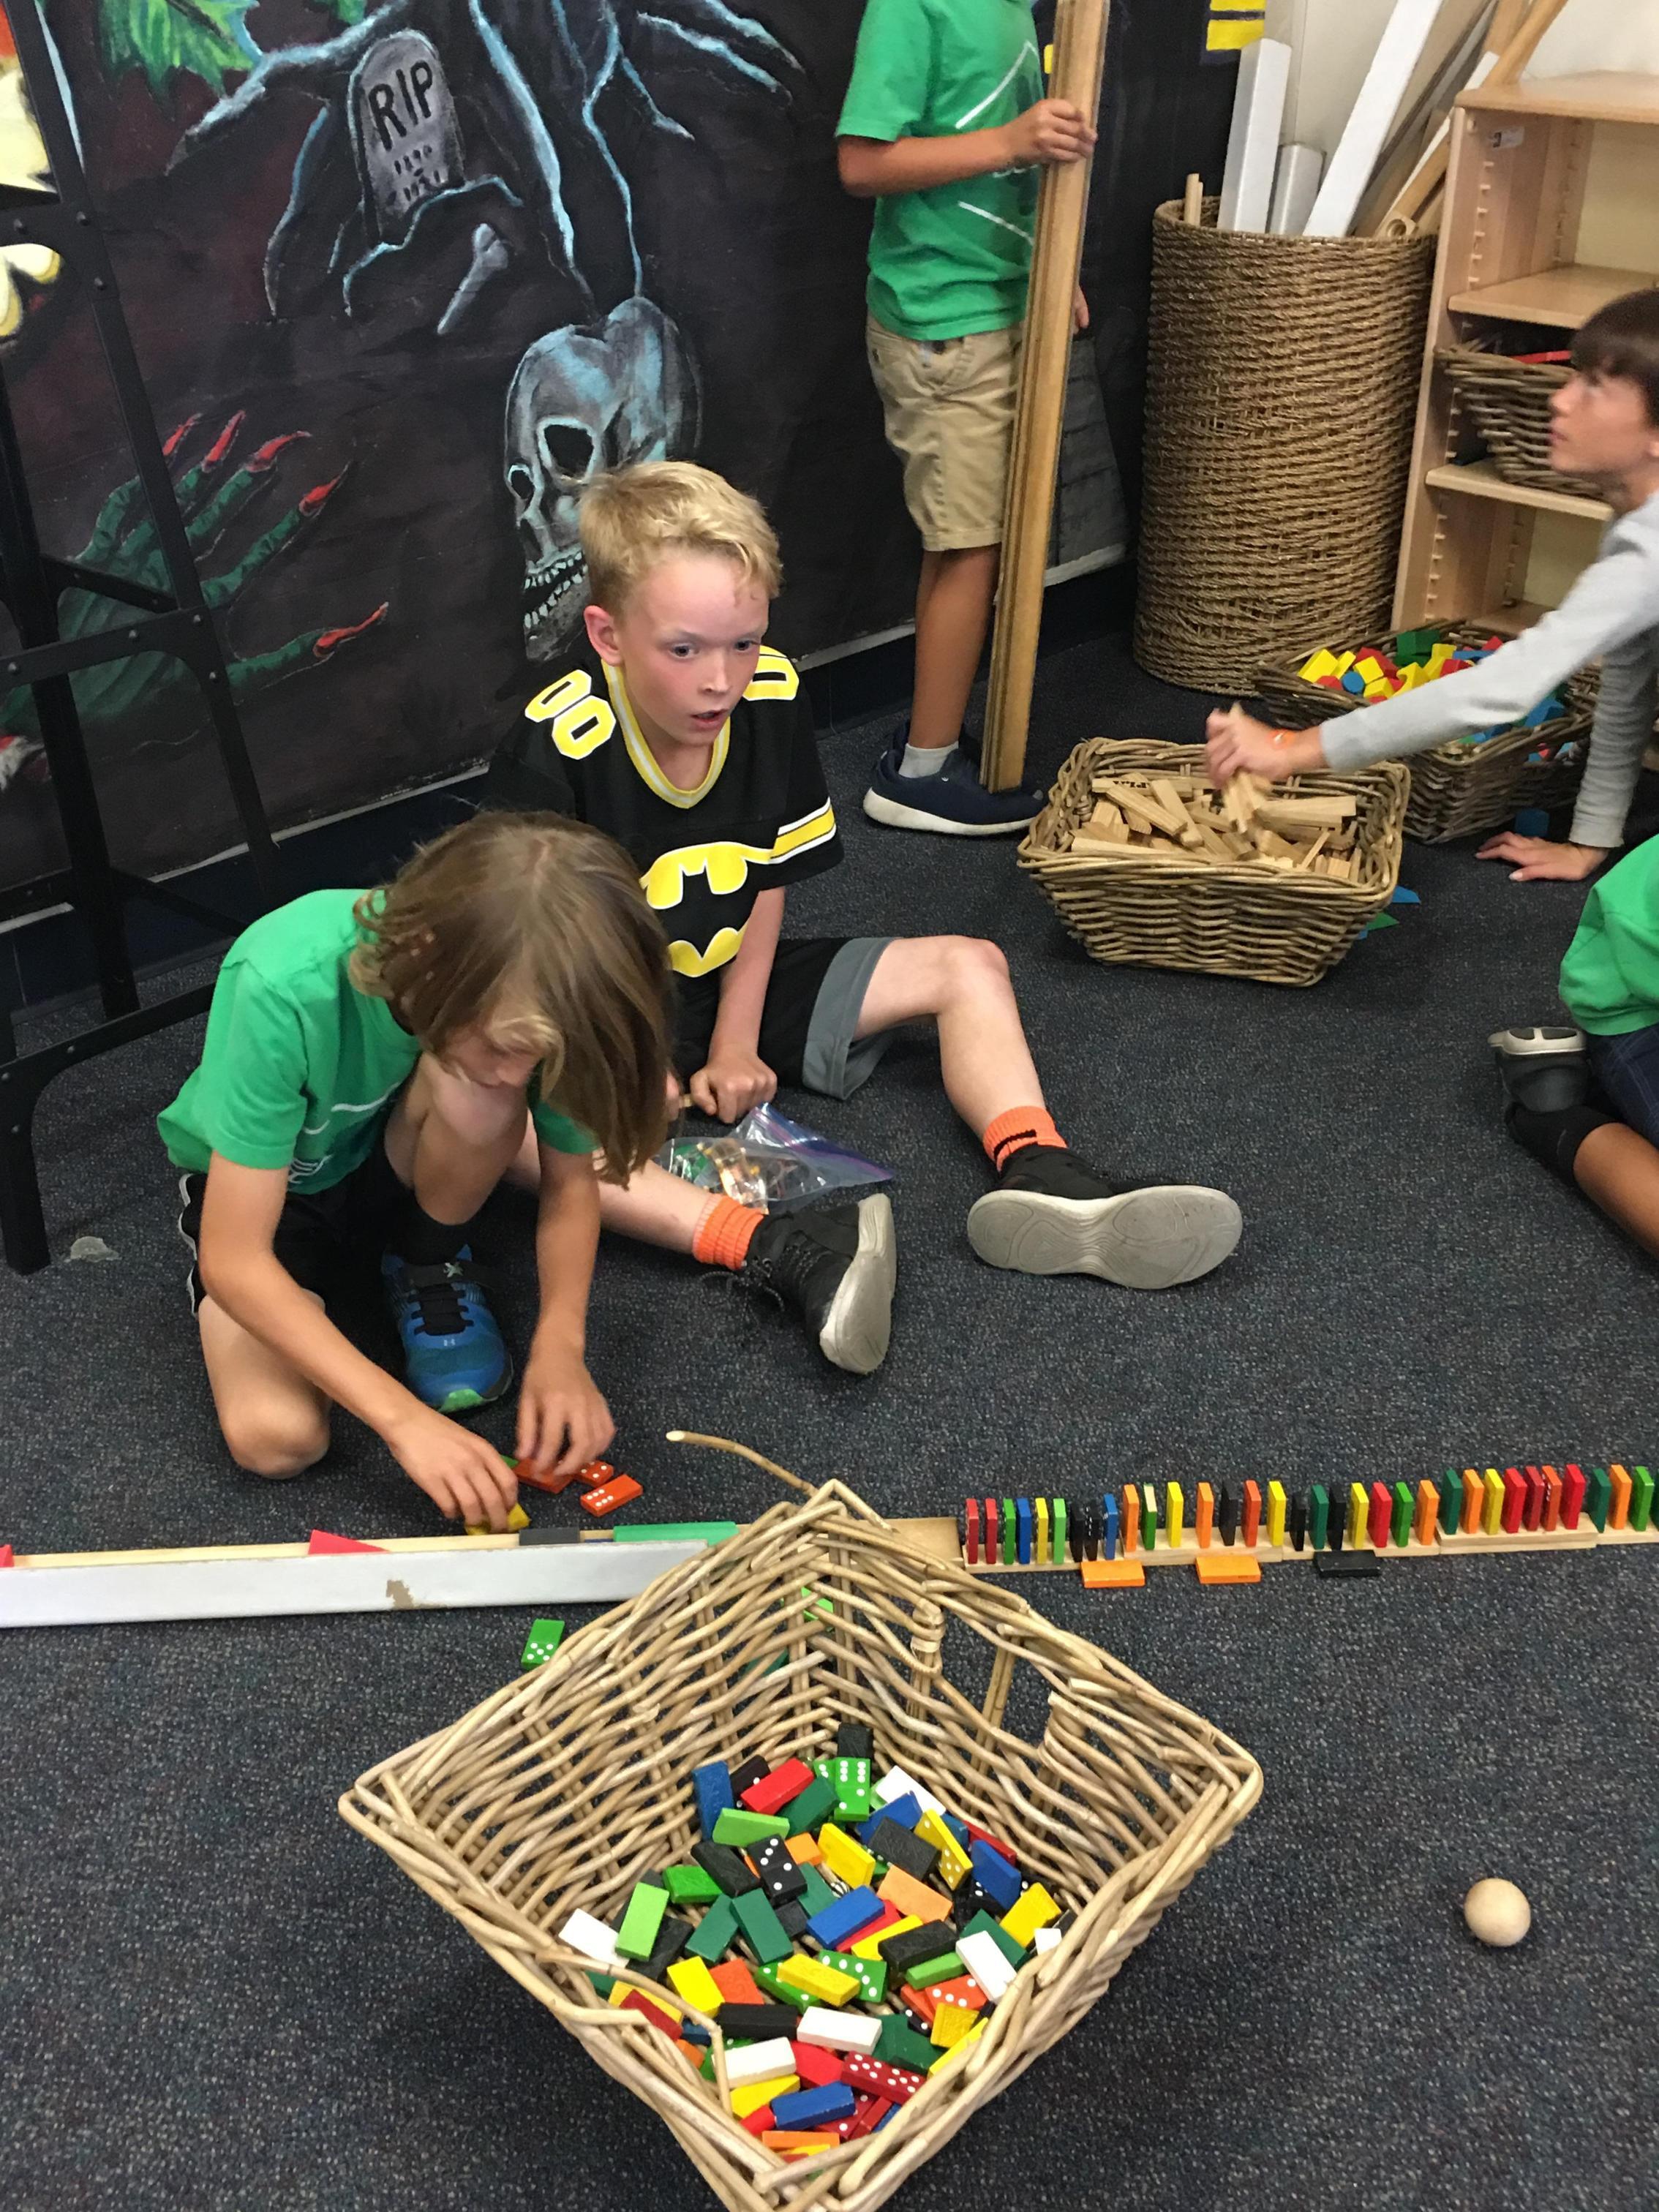 3 children building with dominoes